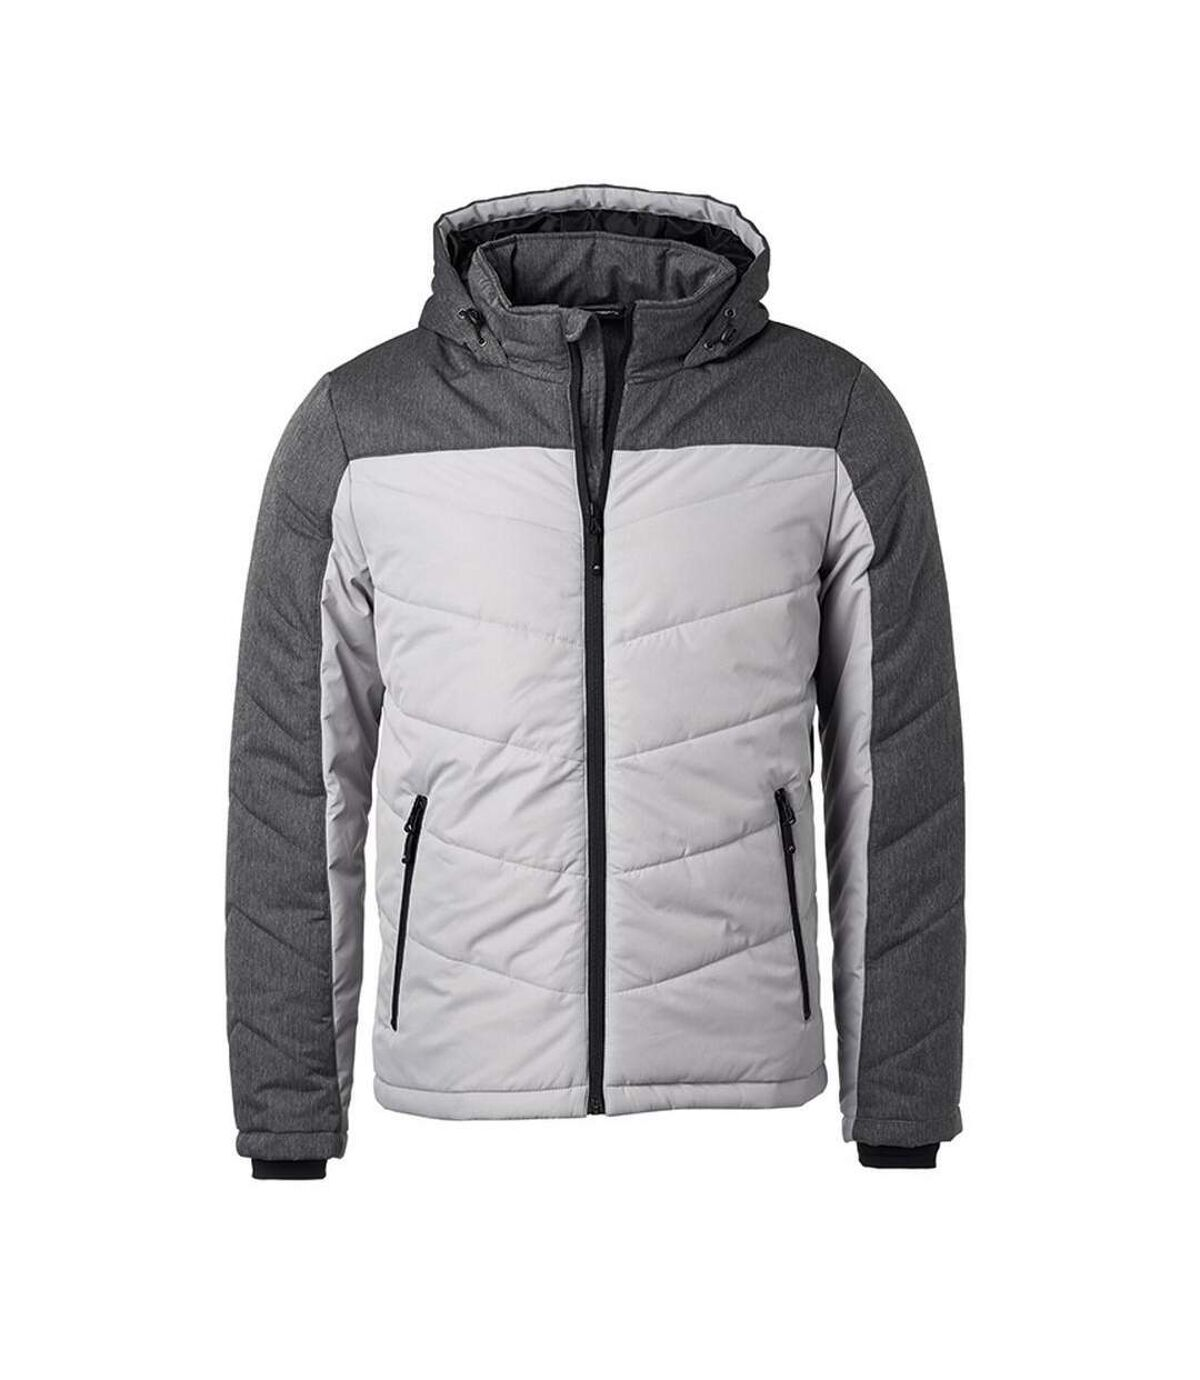 James and Nicholson Mens Winter Jacket (Silver/Anthracite Melange) - UTFU432